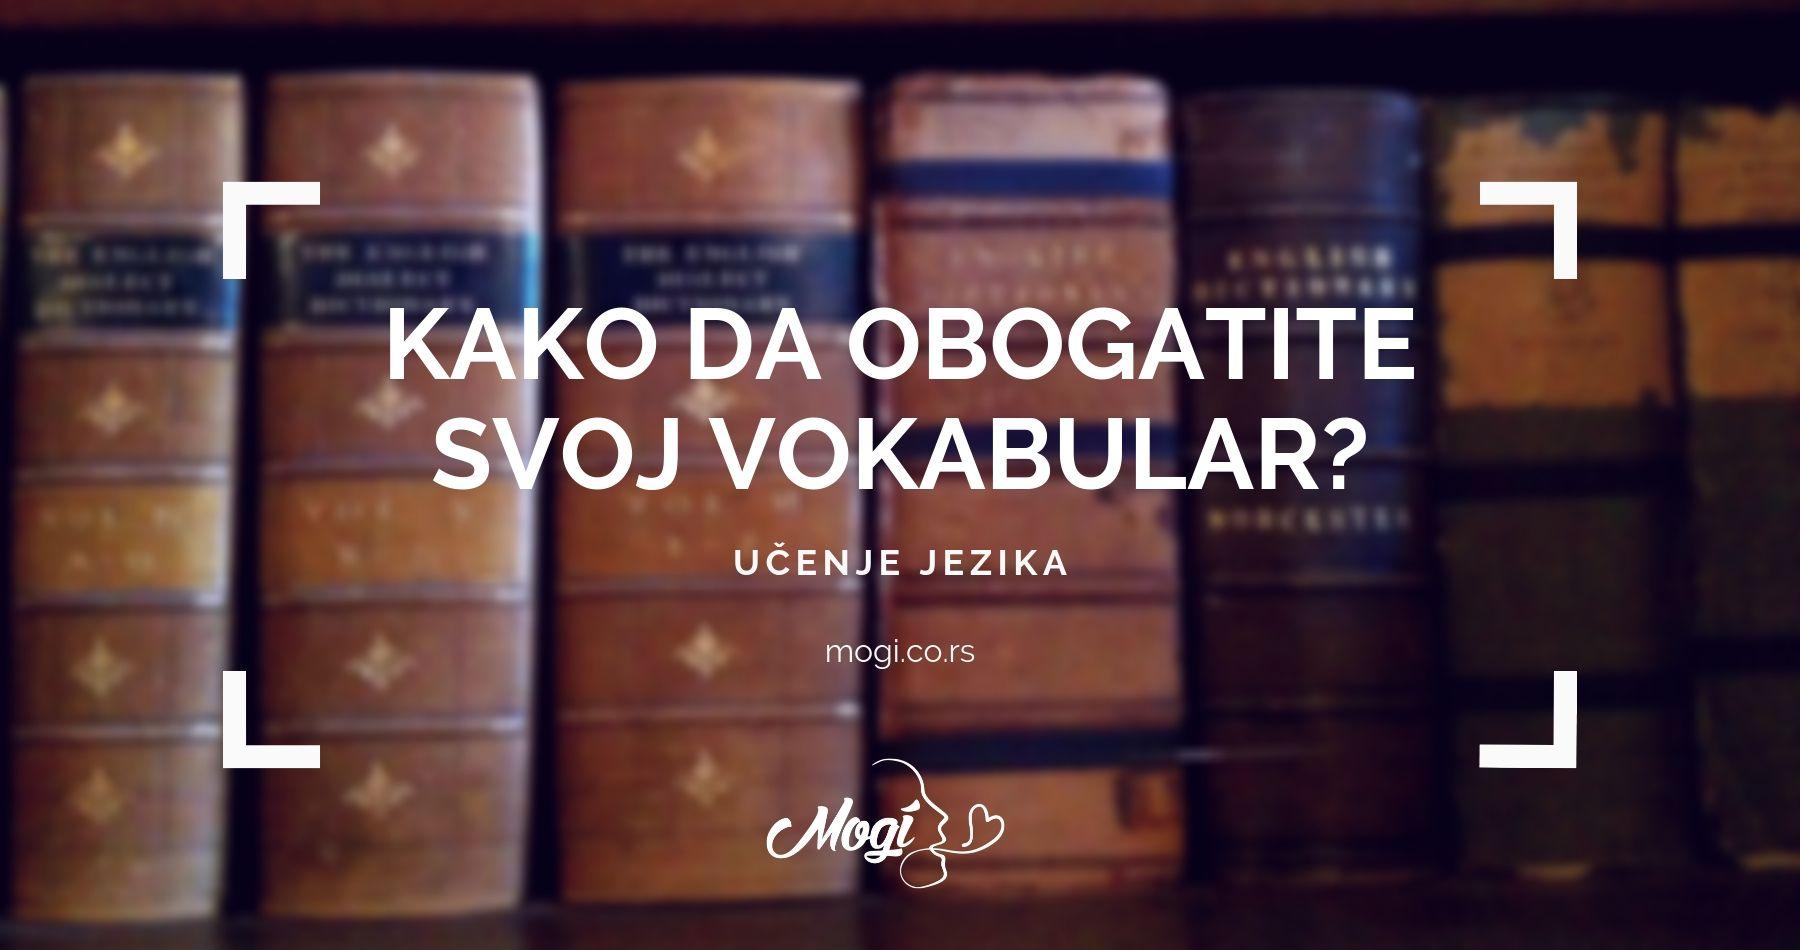 Profesori u školi jezika Mogi pomoći će vam da obogatite svoj vokabular za željeni jezik